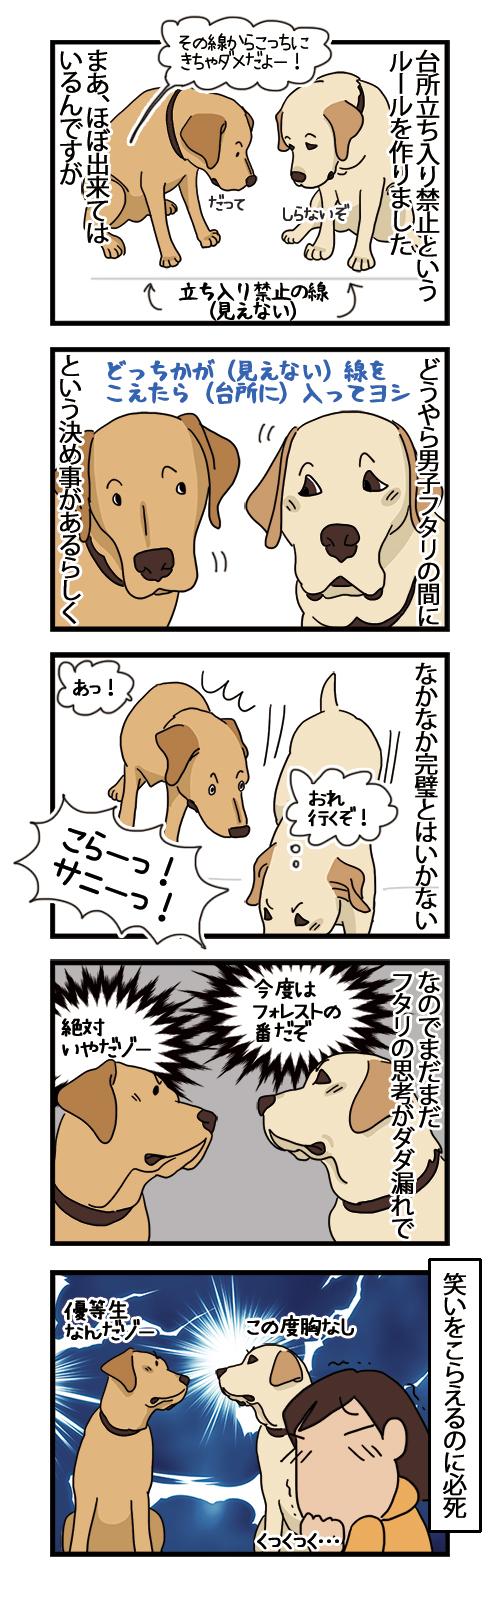 19112020_dogcomic.jpg